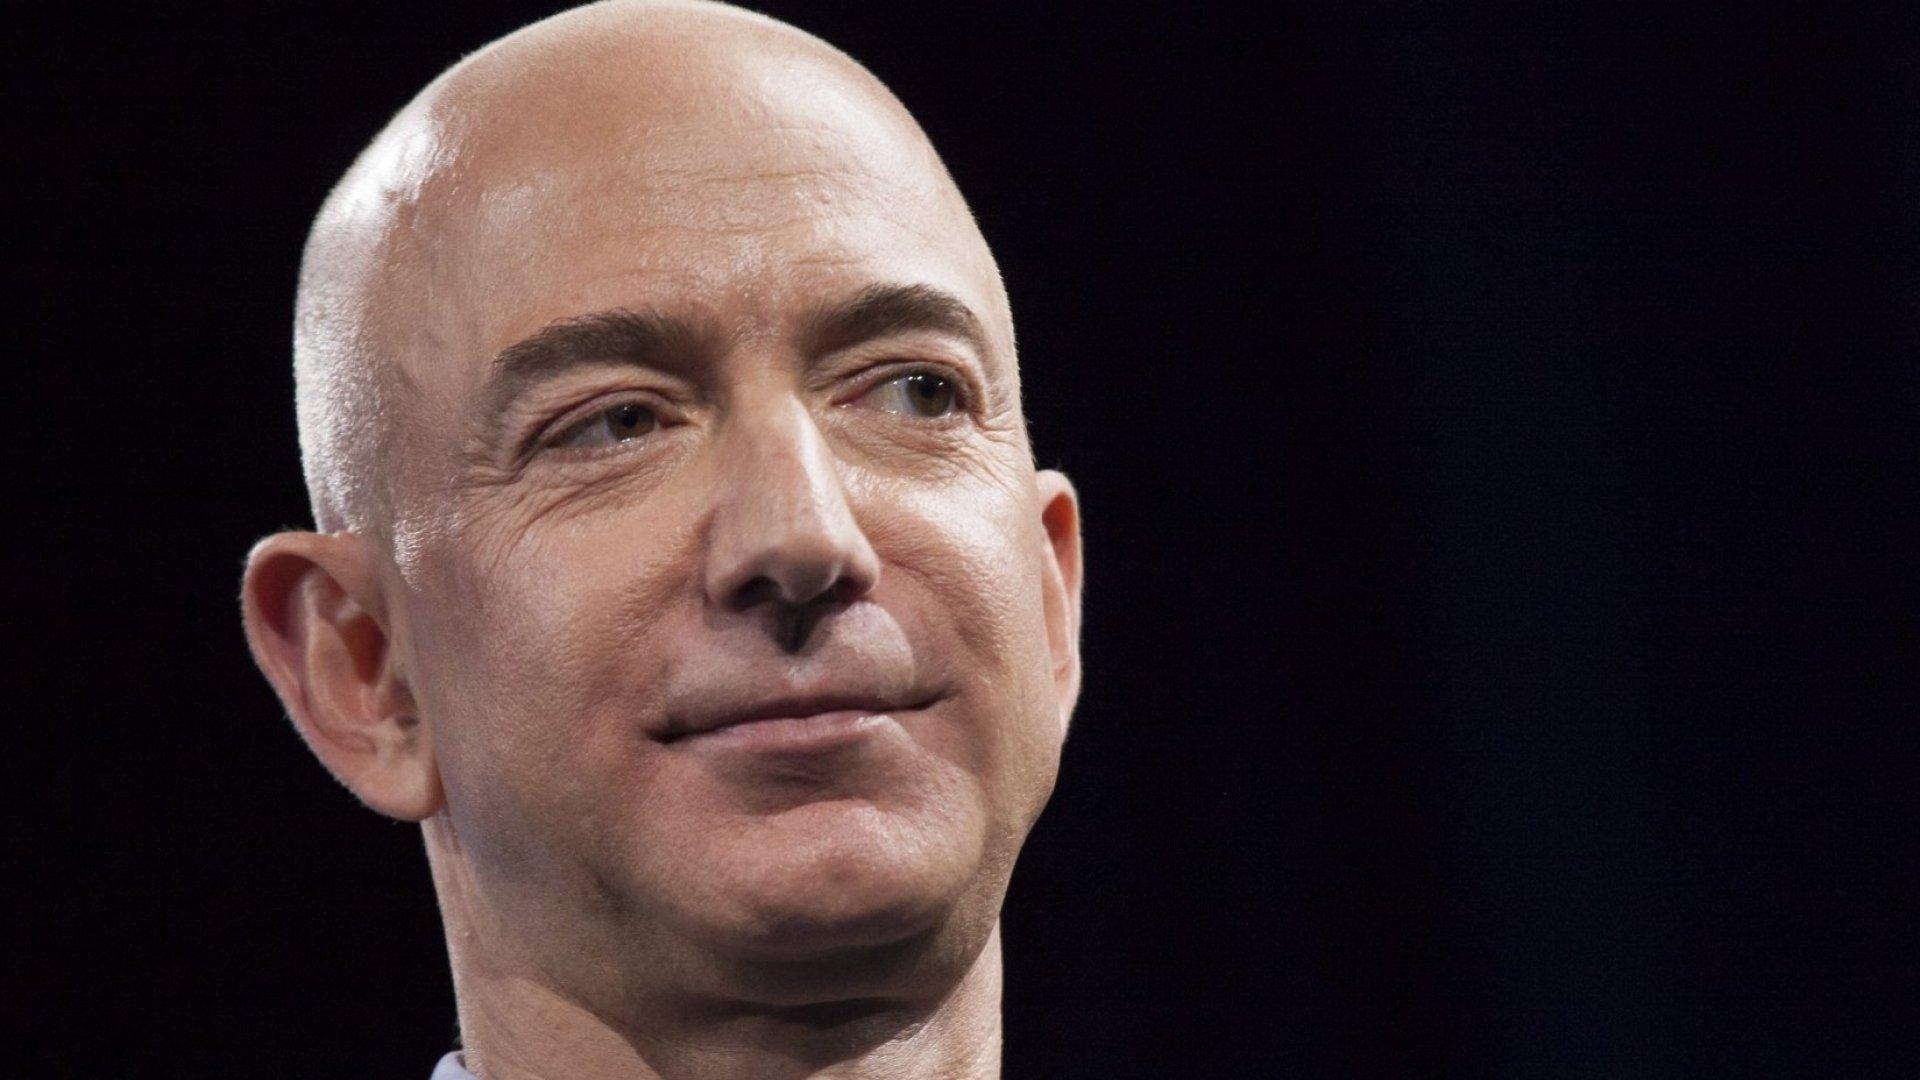 Jeff Bezos has one more wrinkle under his eyes than he had last year. (Chris Matyszczyk estimate.)